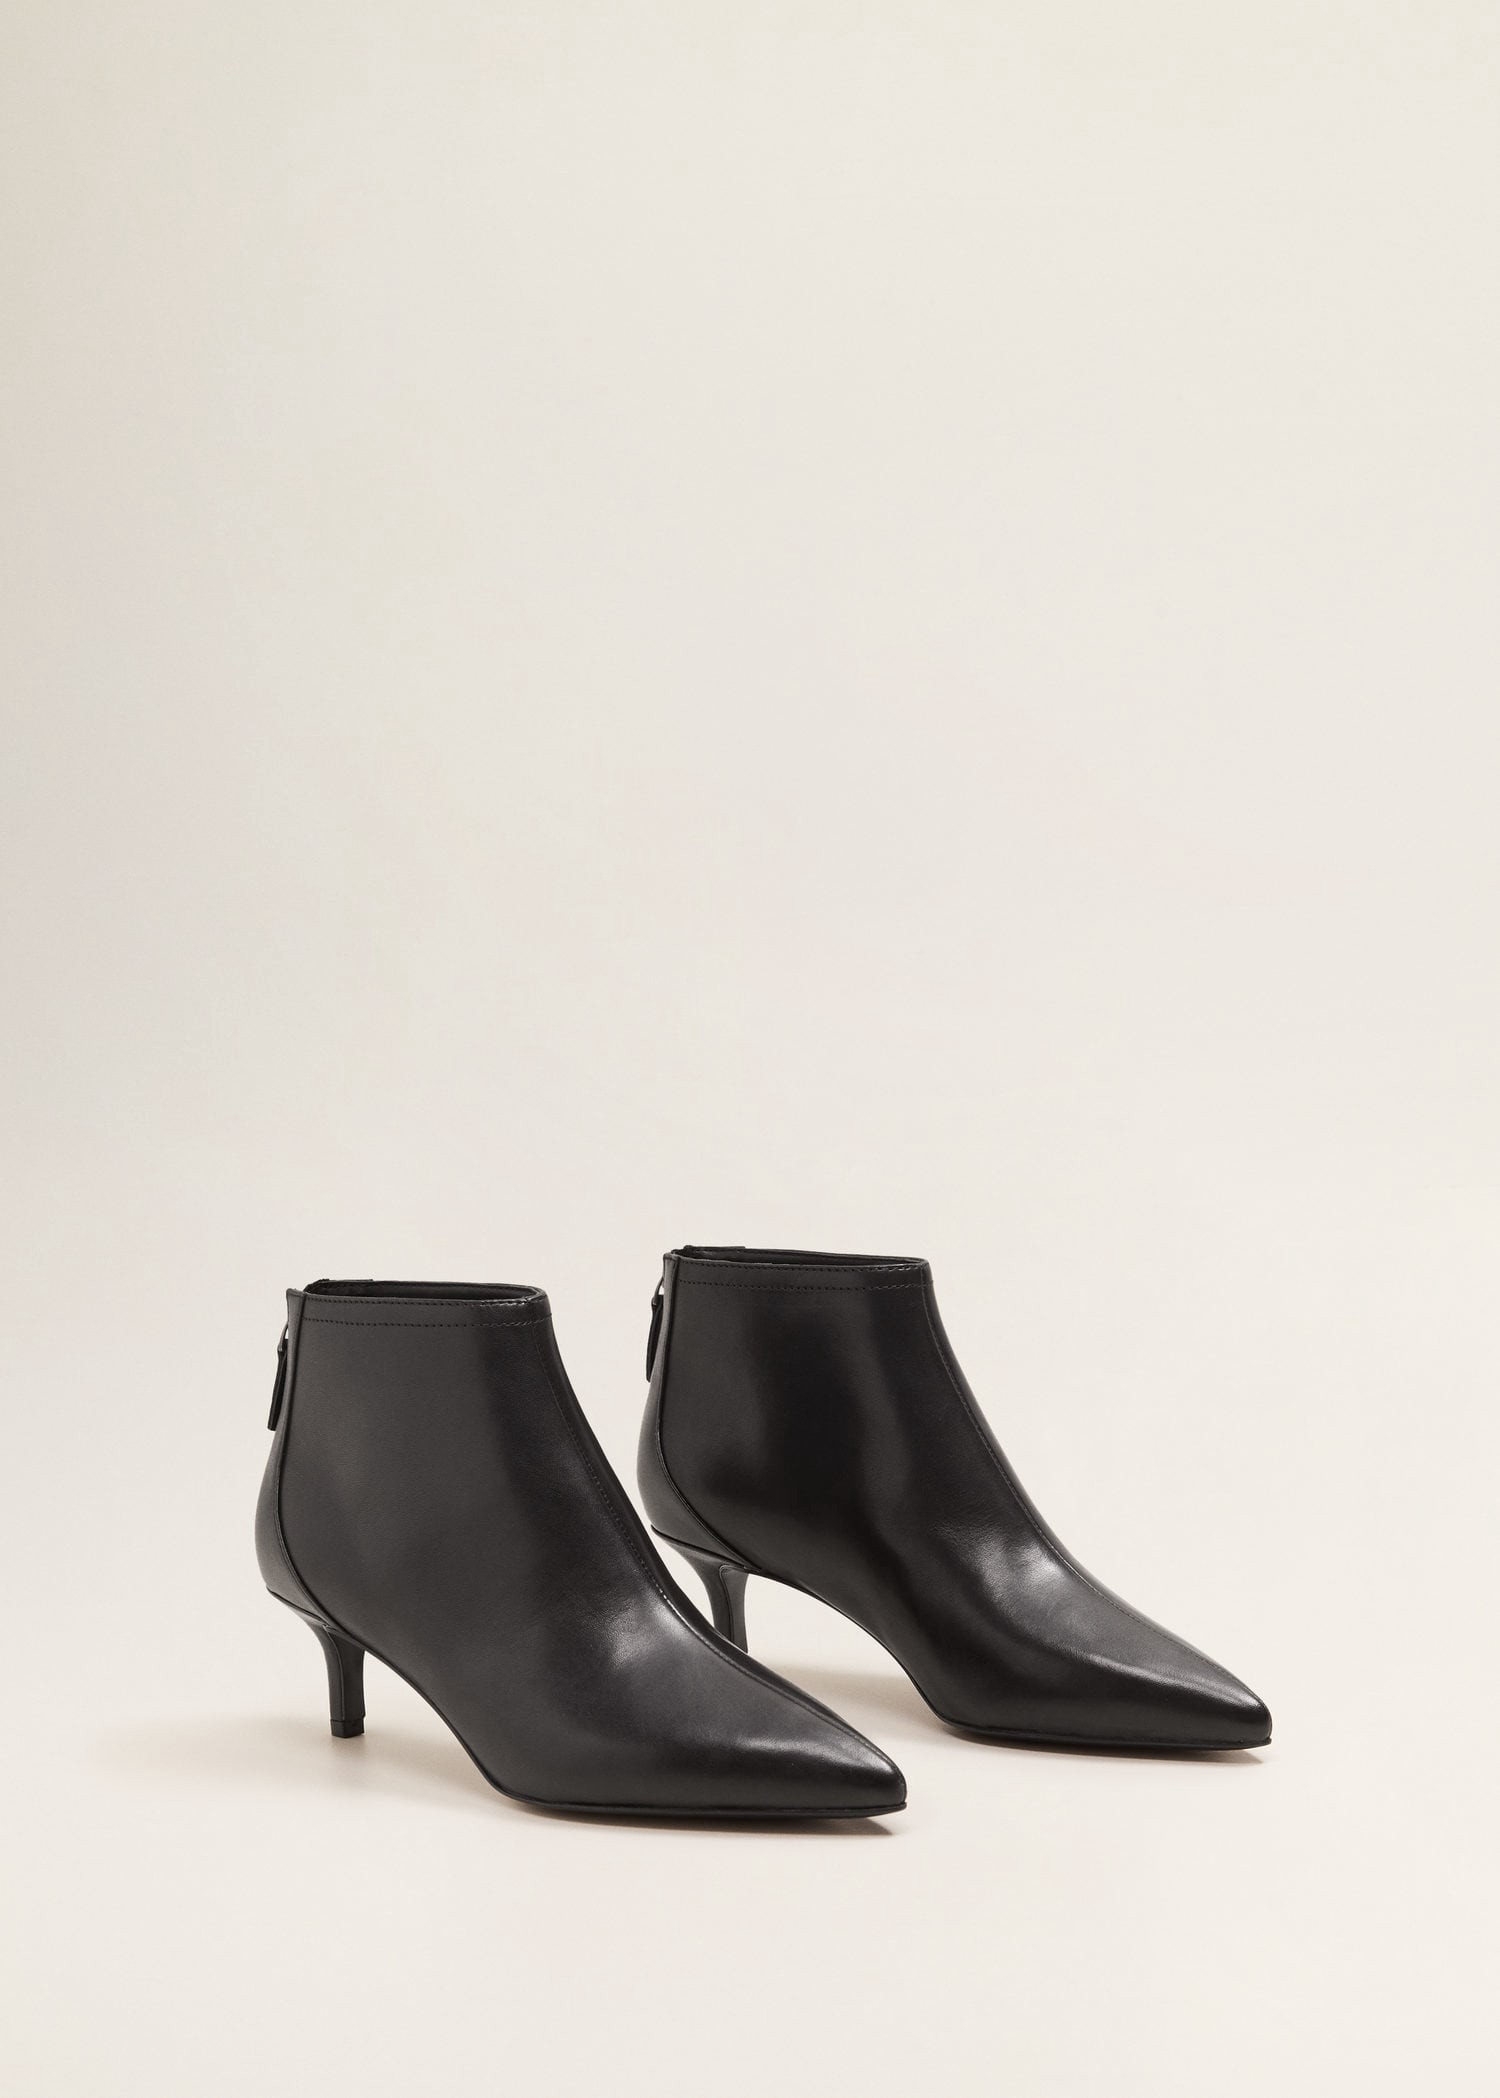 52b7e24b65b Mango Midi Heel Leather Ankle Boot - 5   Products   Kitten heel ...